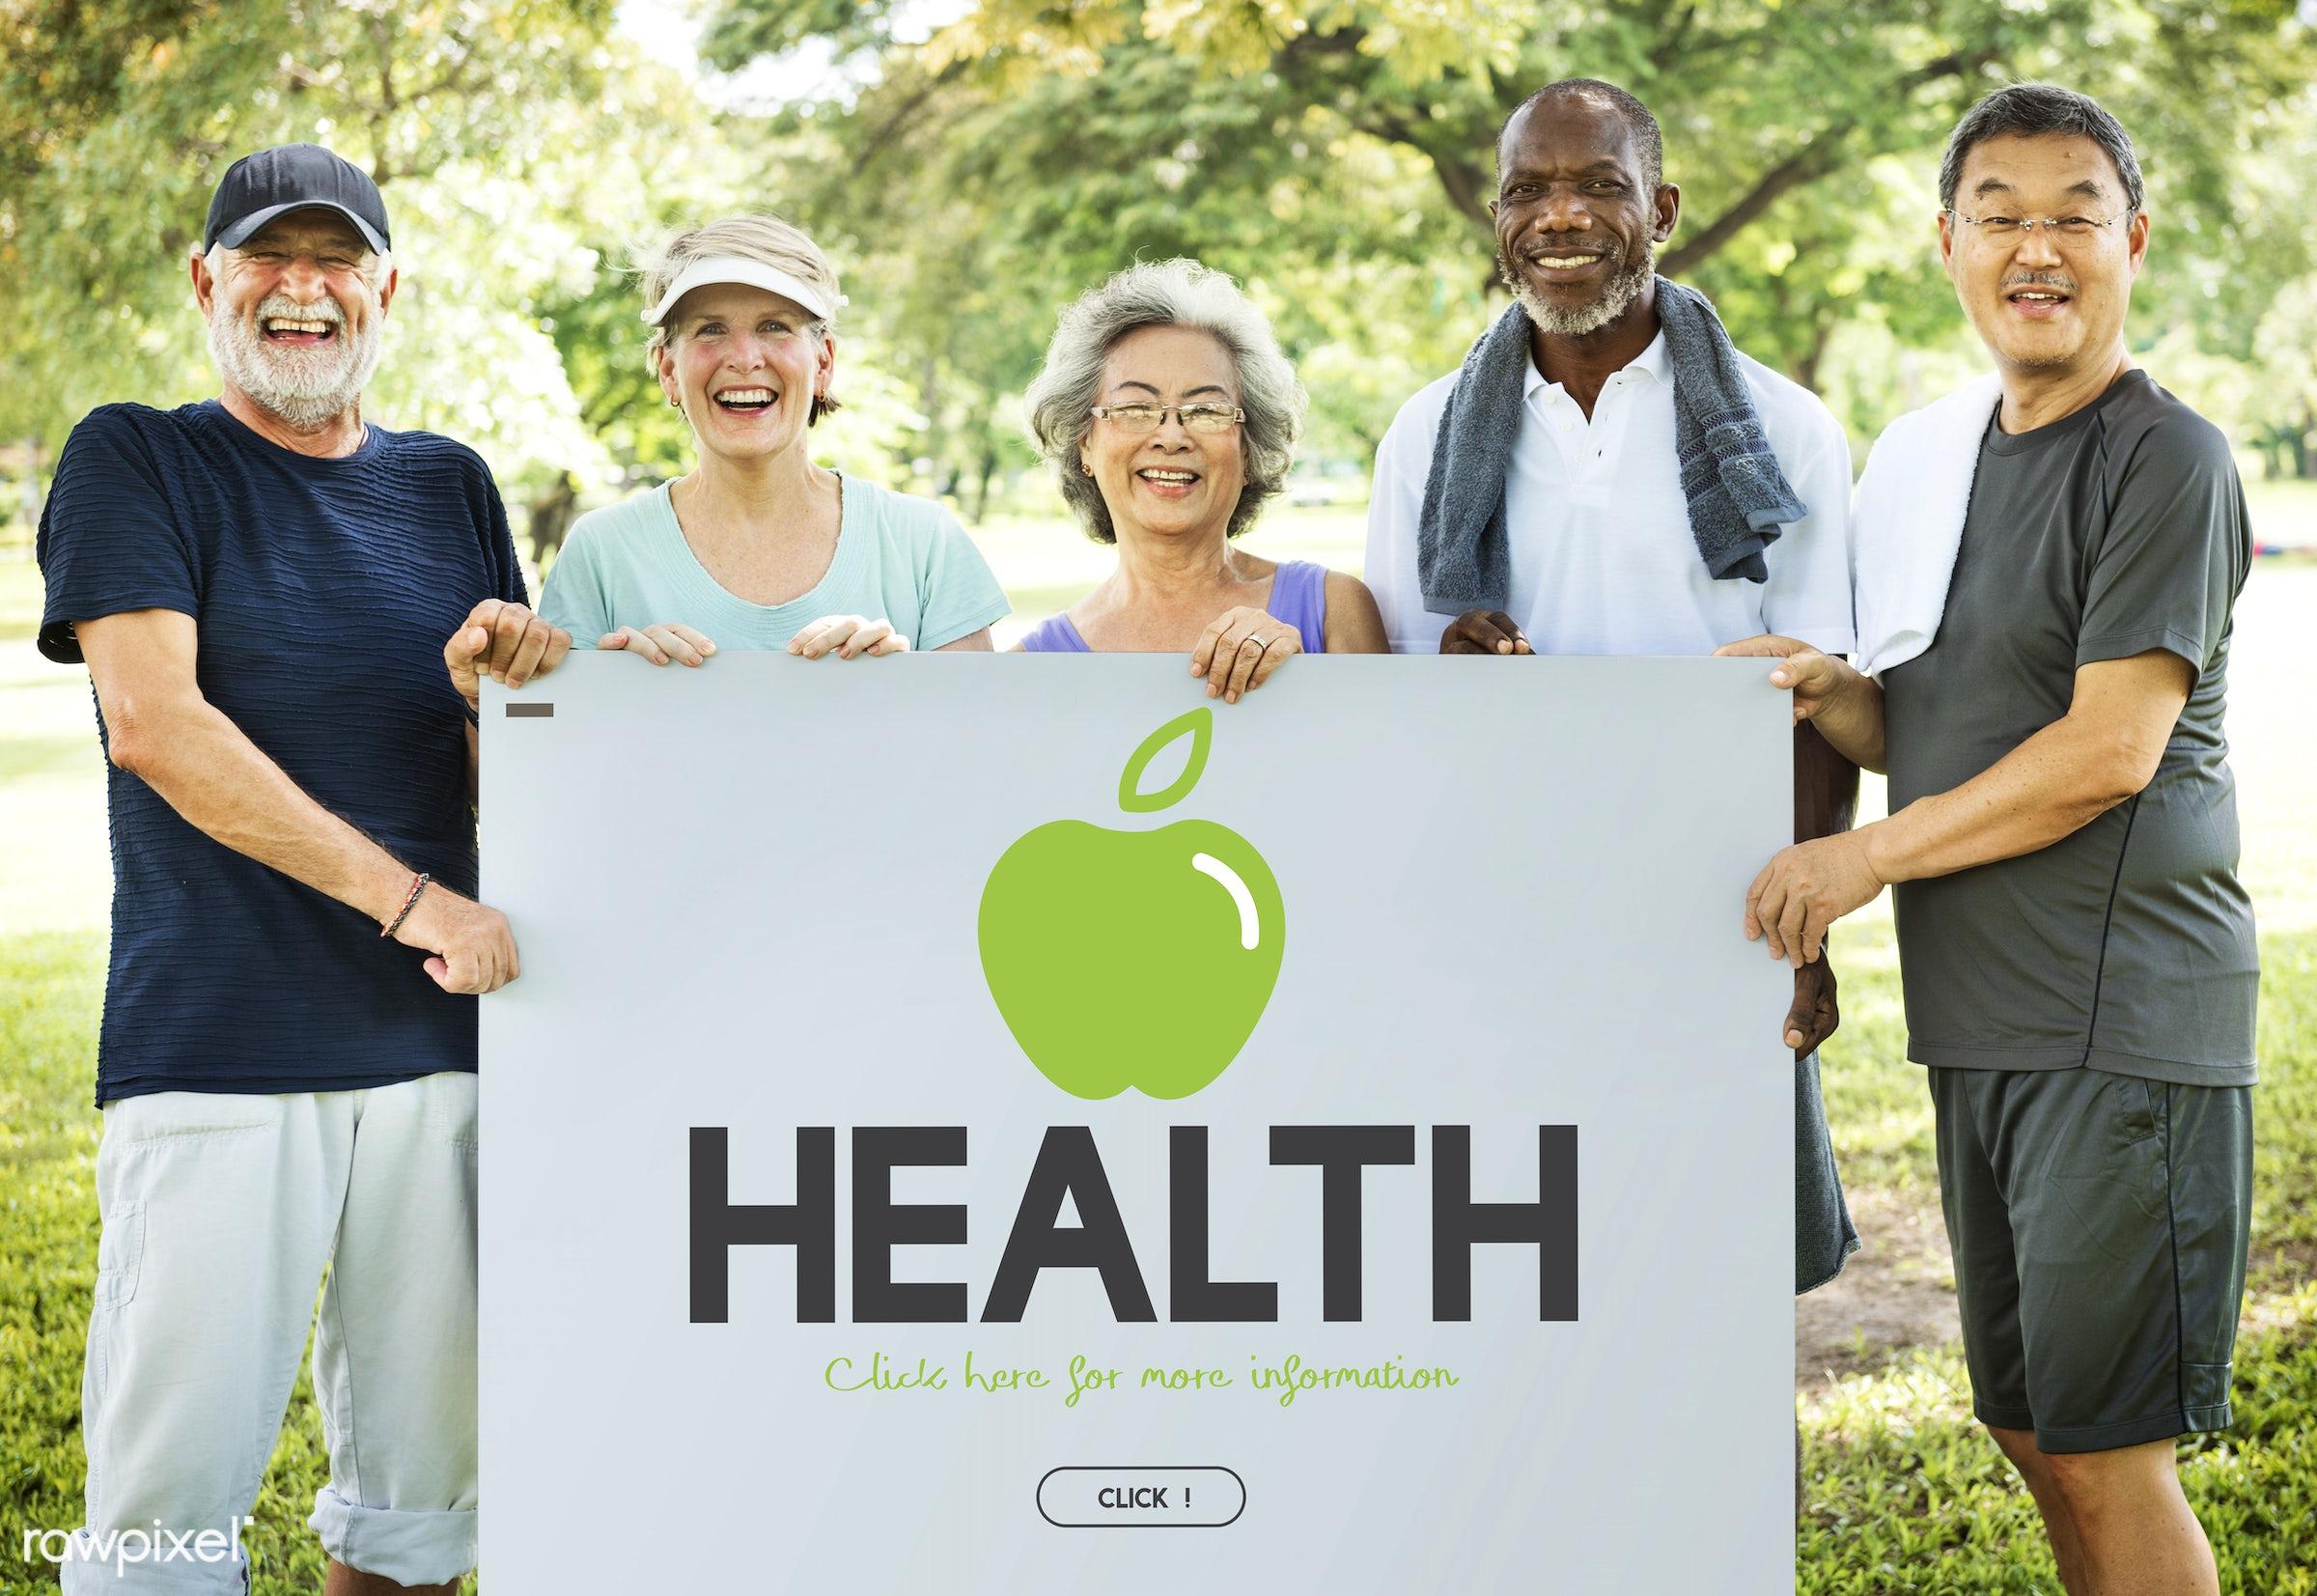 medical, mind, adult, apple, care, diet, diversity, elderly, environment, exercise, fit, friends, friendship, graphics,...